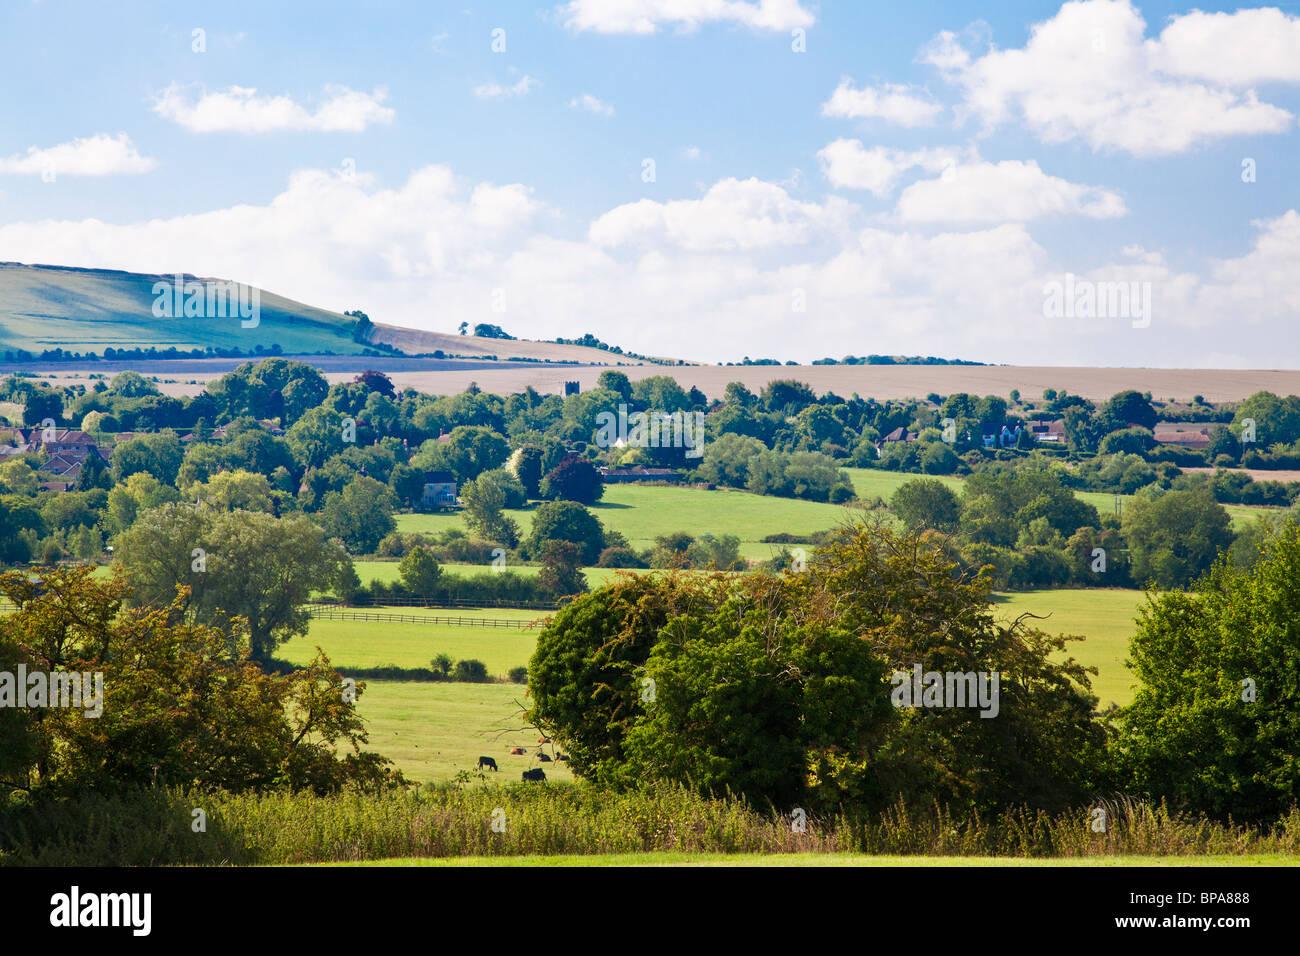 View from Upper Wanborough towards Liddington in Wiltshire, England, UK - Stock Image